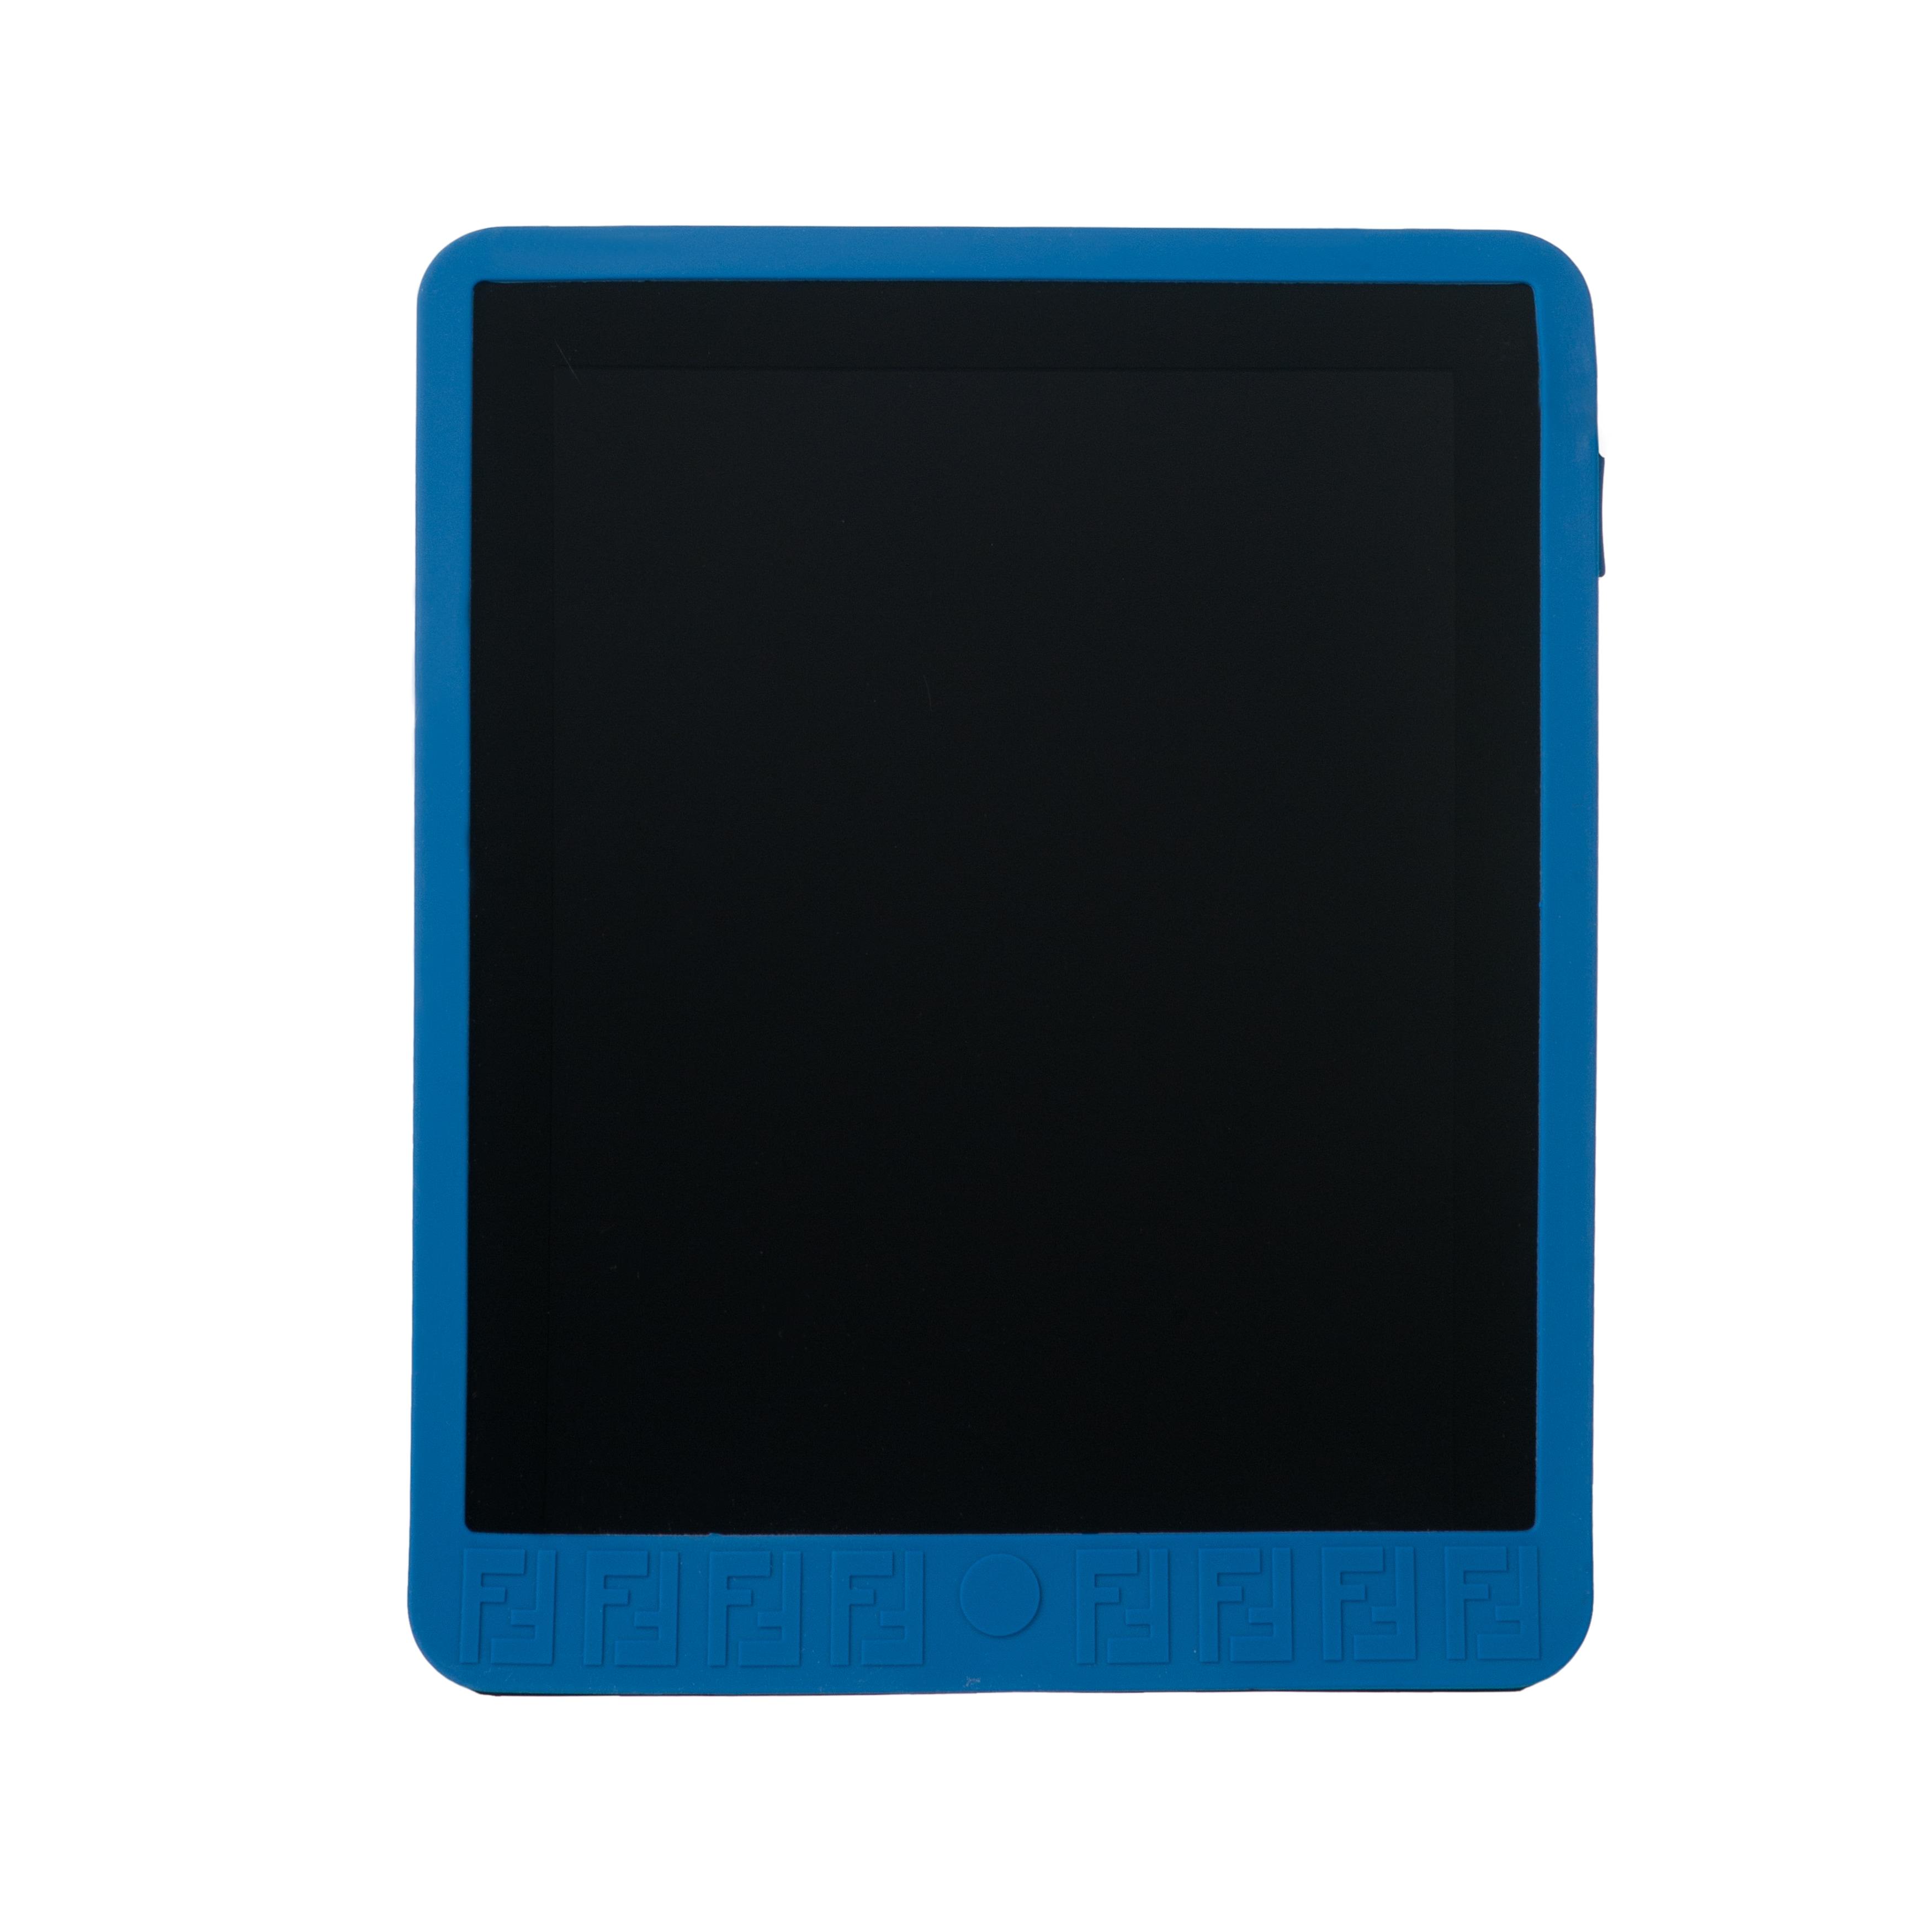 Fendi Royal Blue Zucchino Rubber iPad Case for iPad 1